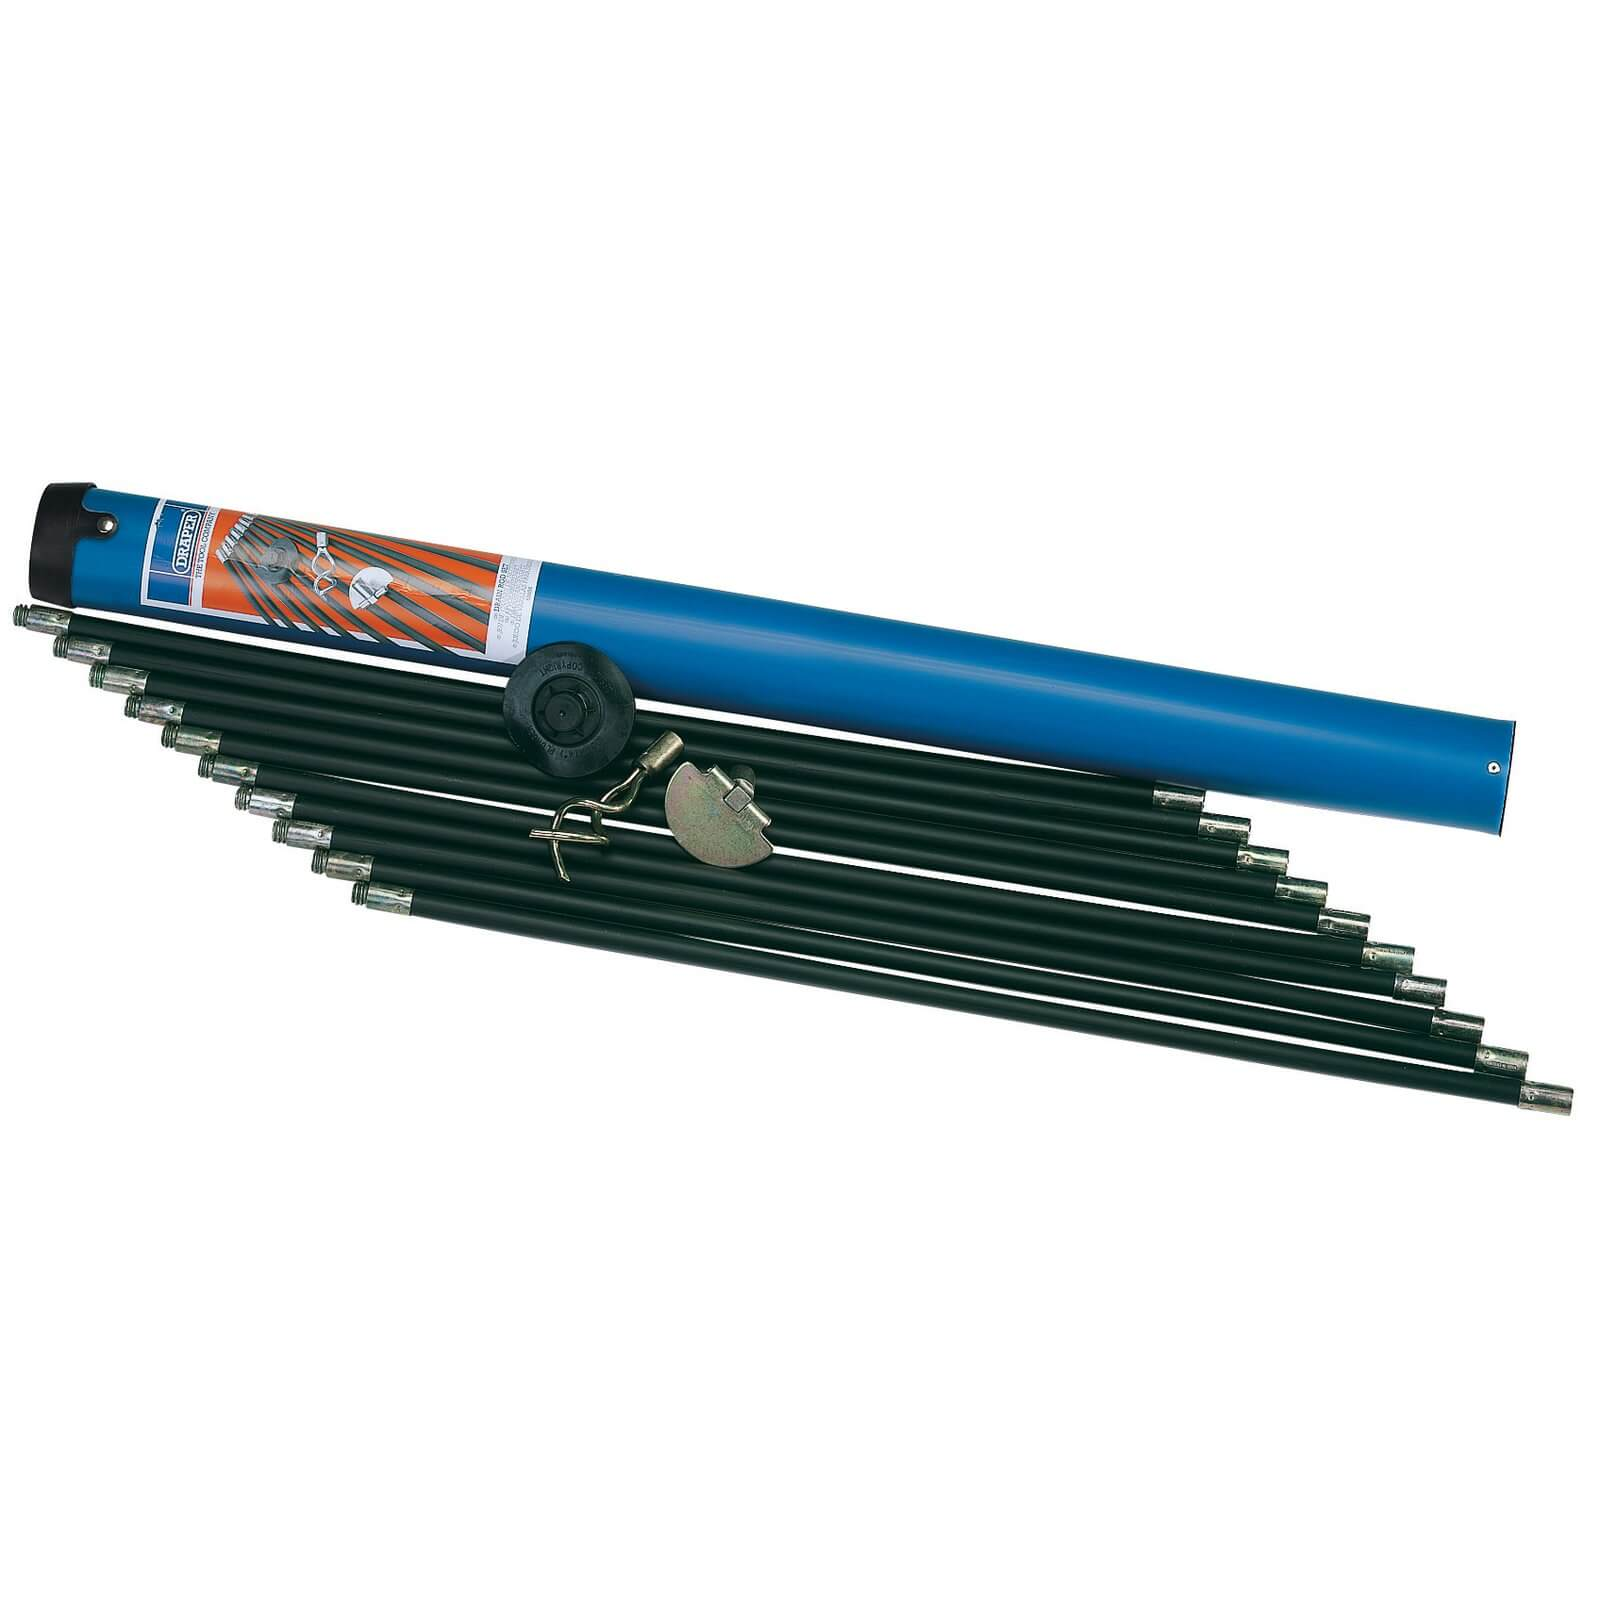 Image of Draper 13 Piece Polypropylene Drain Rod Set